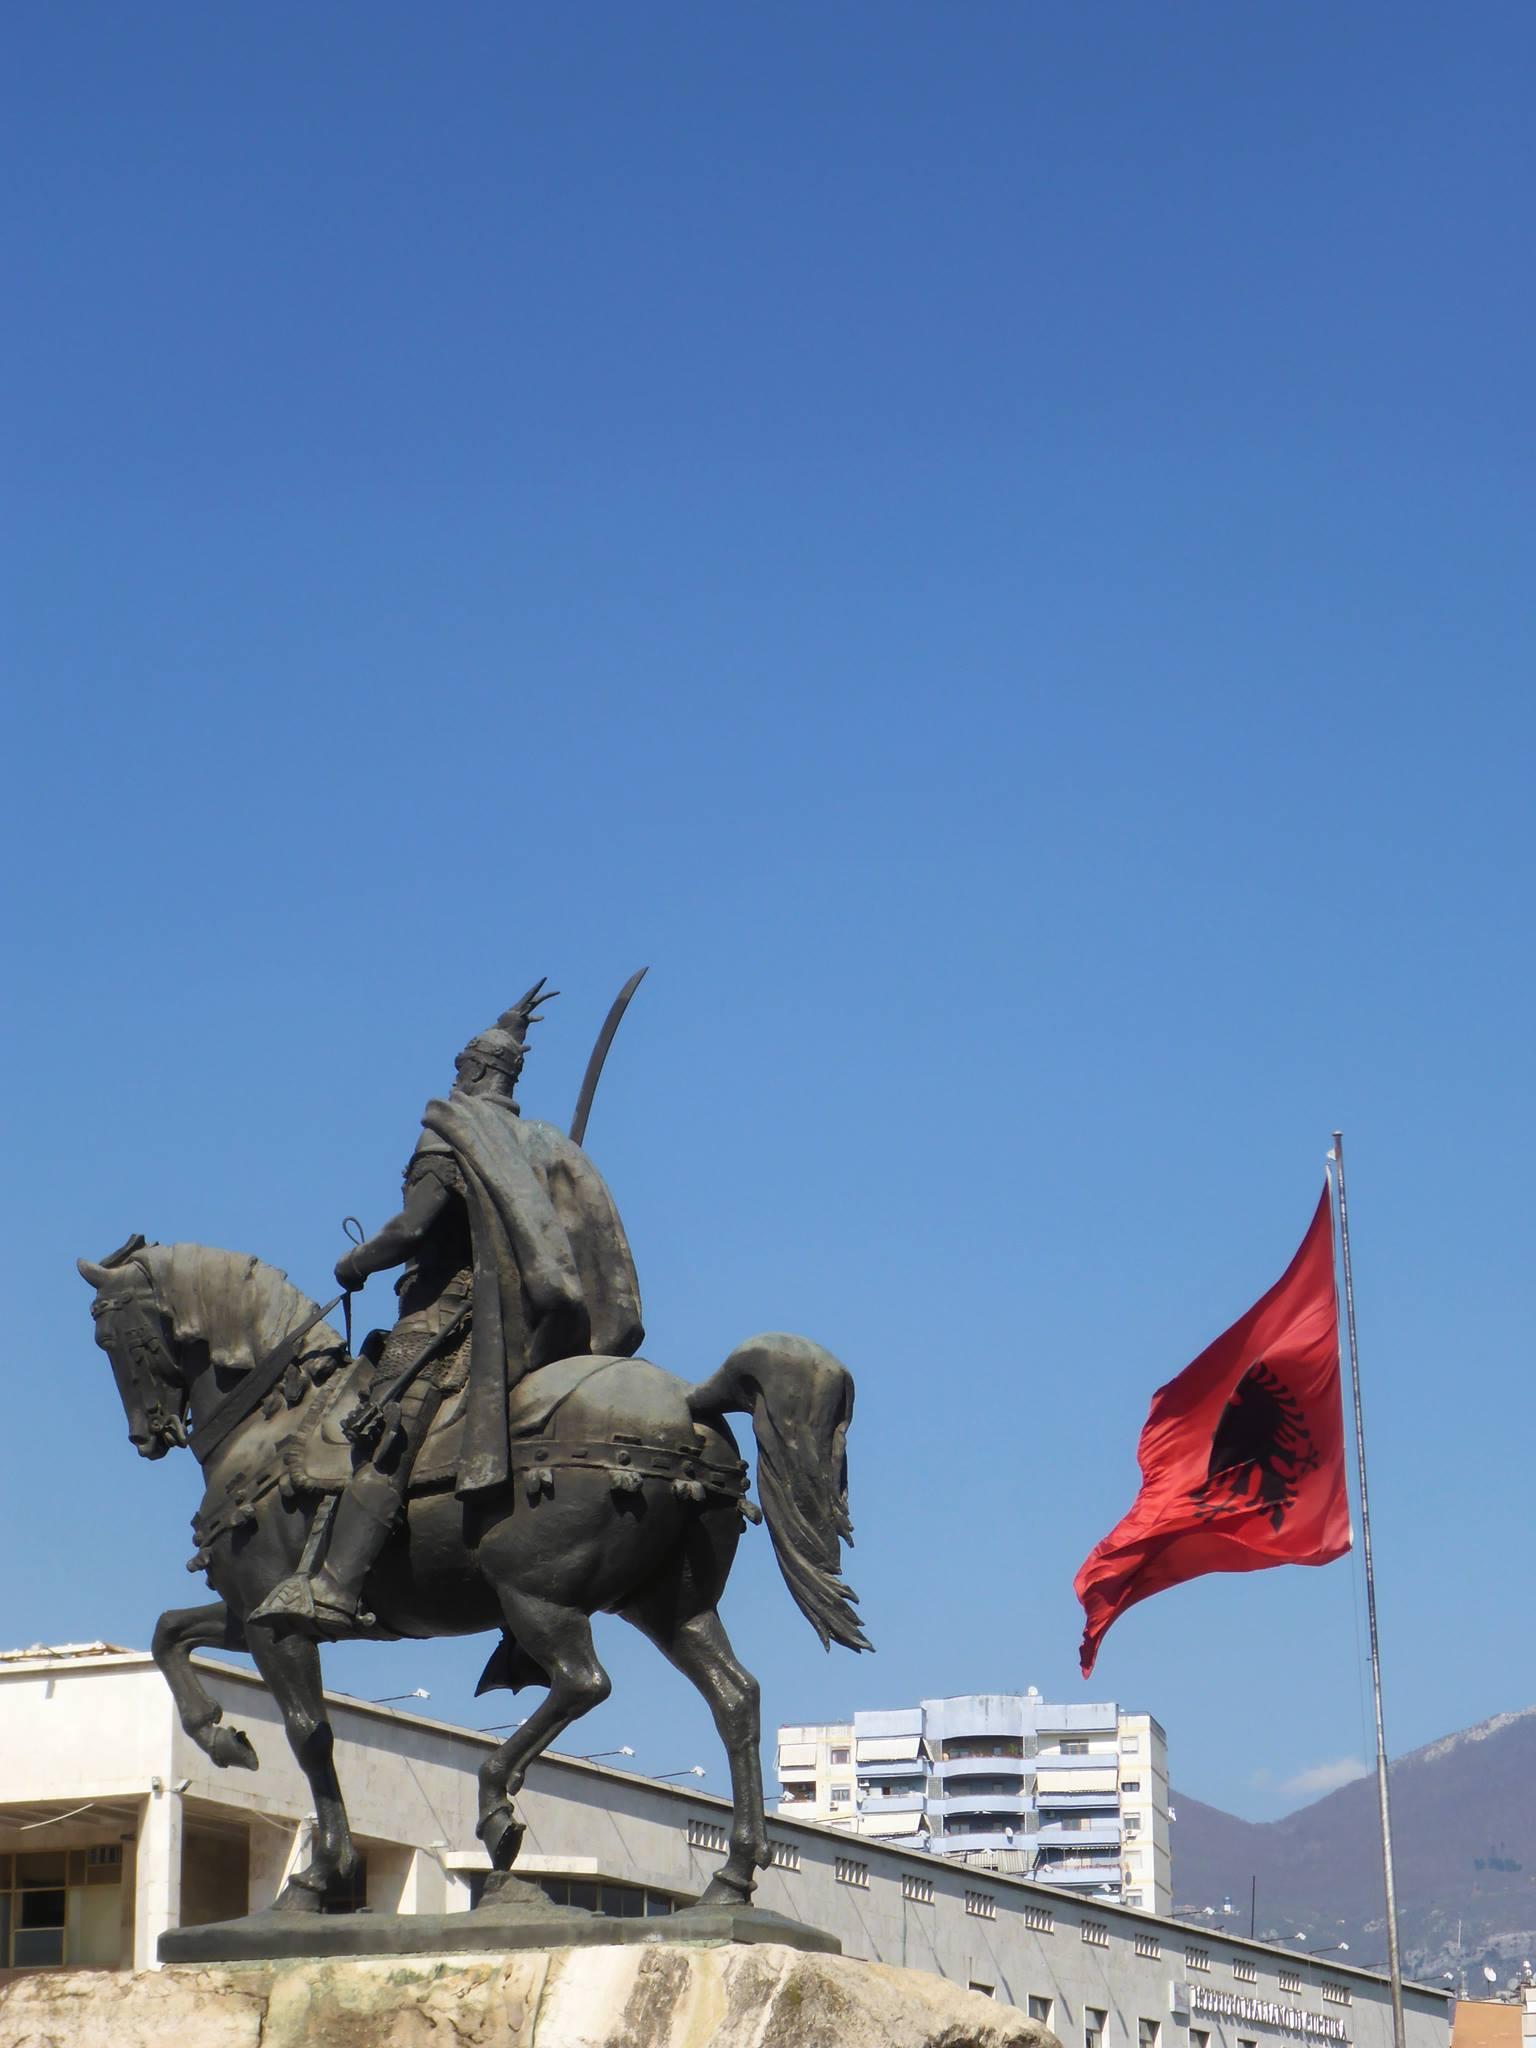 La statue de la place Skanderbeg, le héros national de l'Albanie.